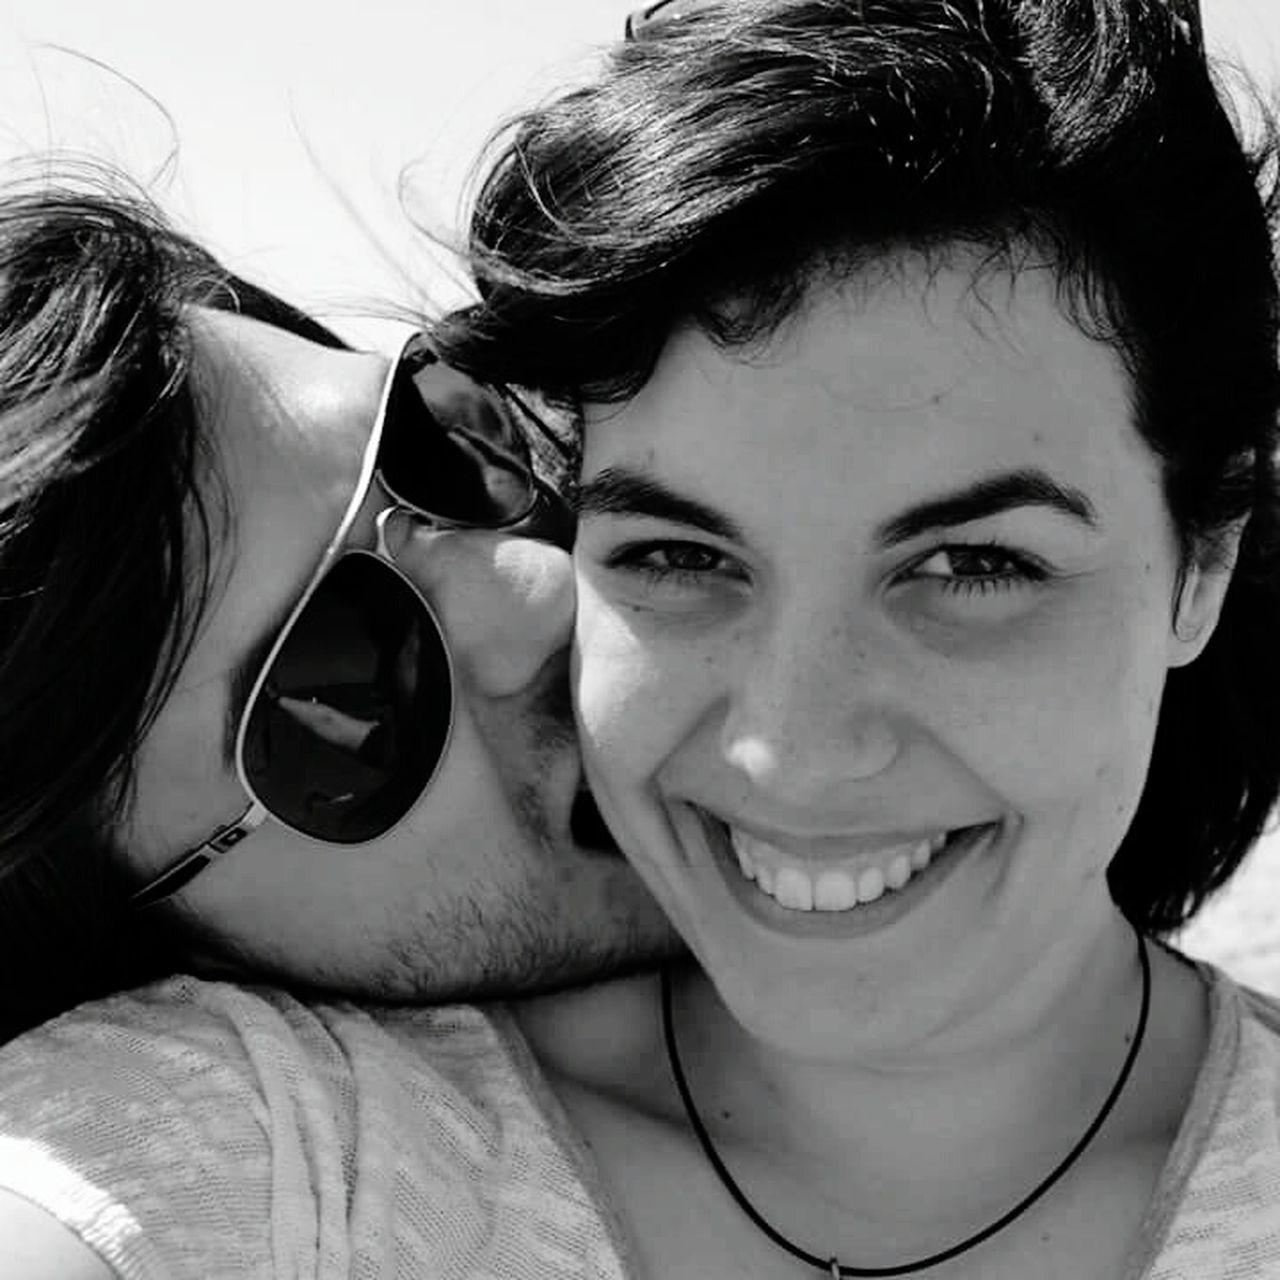 Ti amo ❤ Love Amore Tiamo Instalove Boyfriend Seilamiavita Always